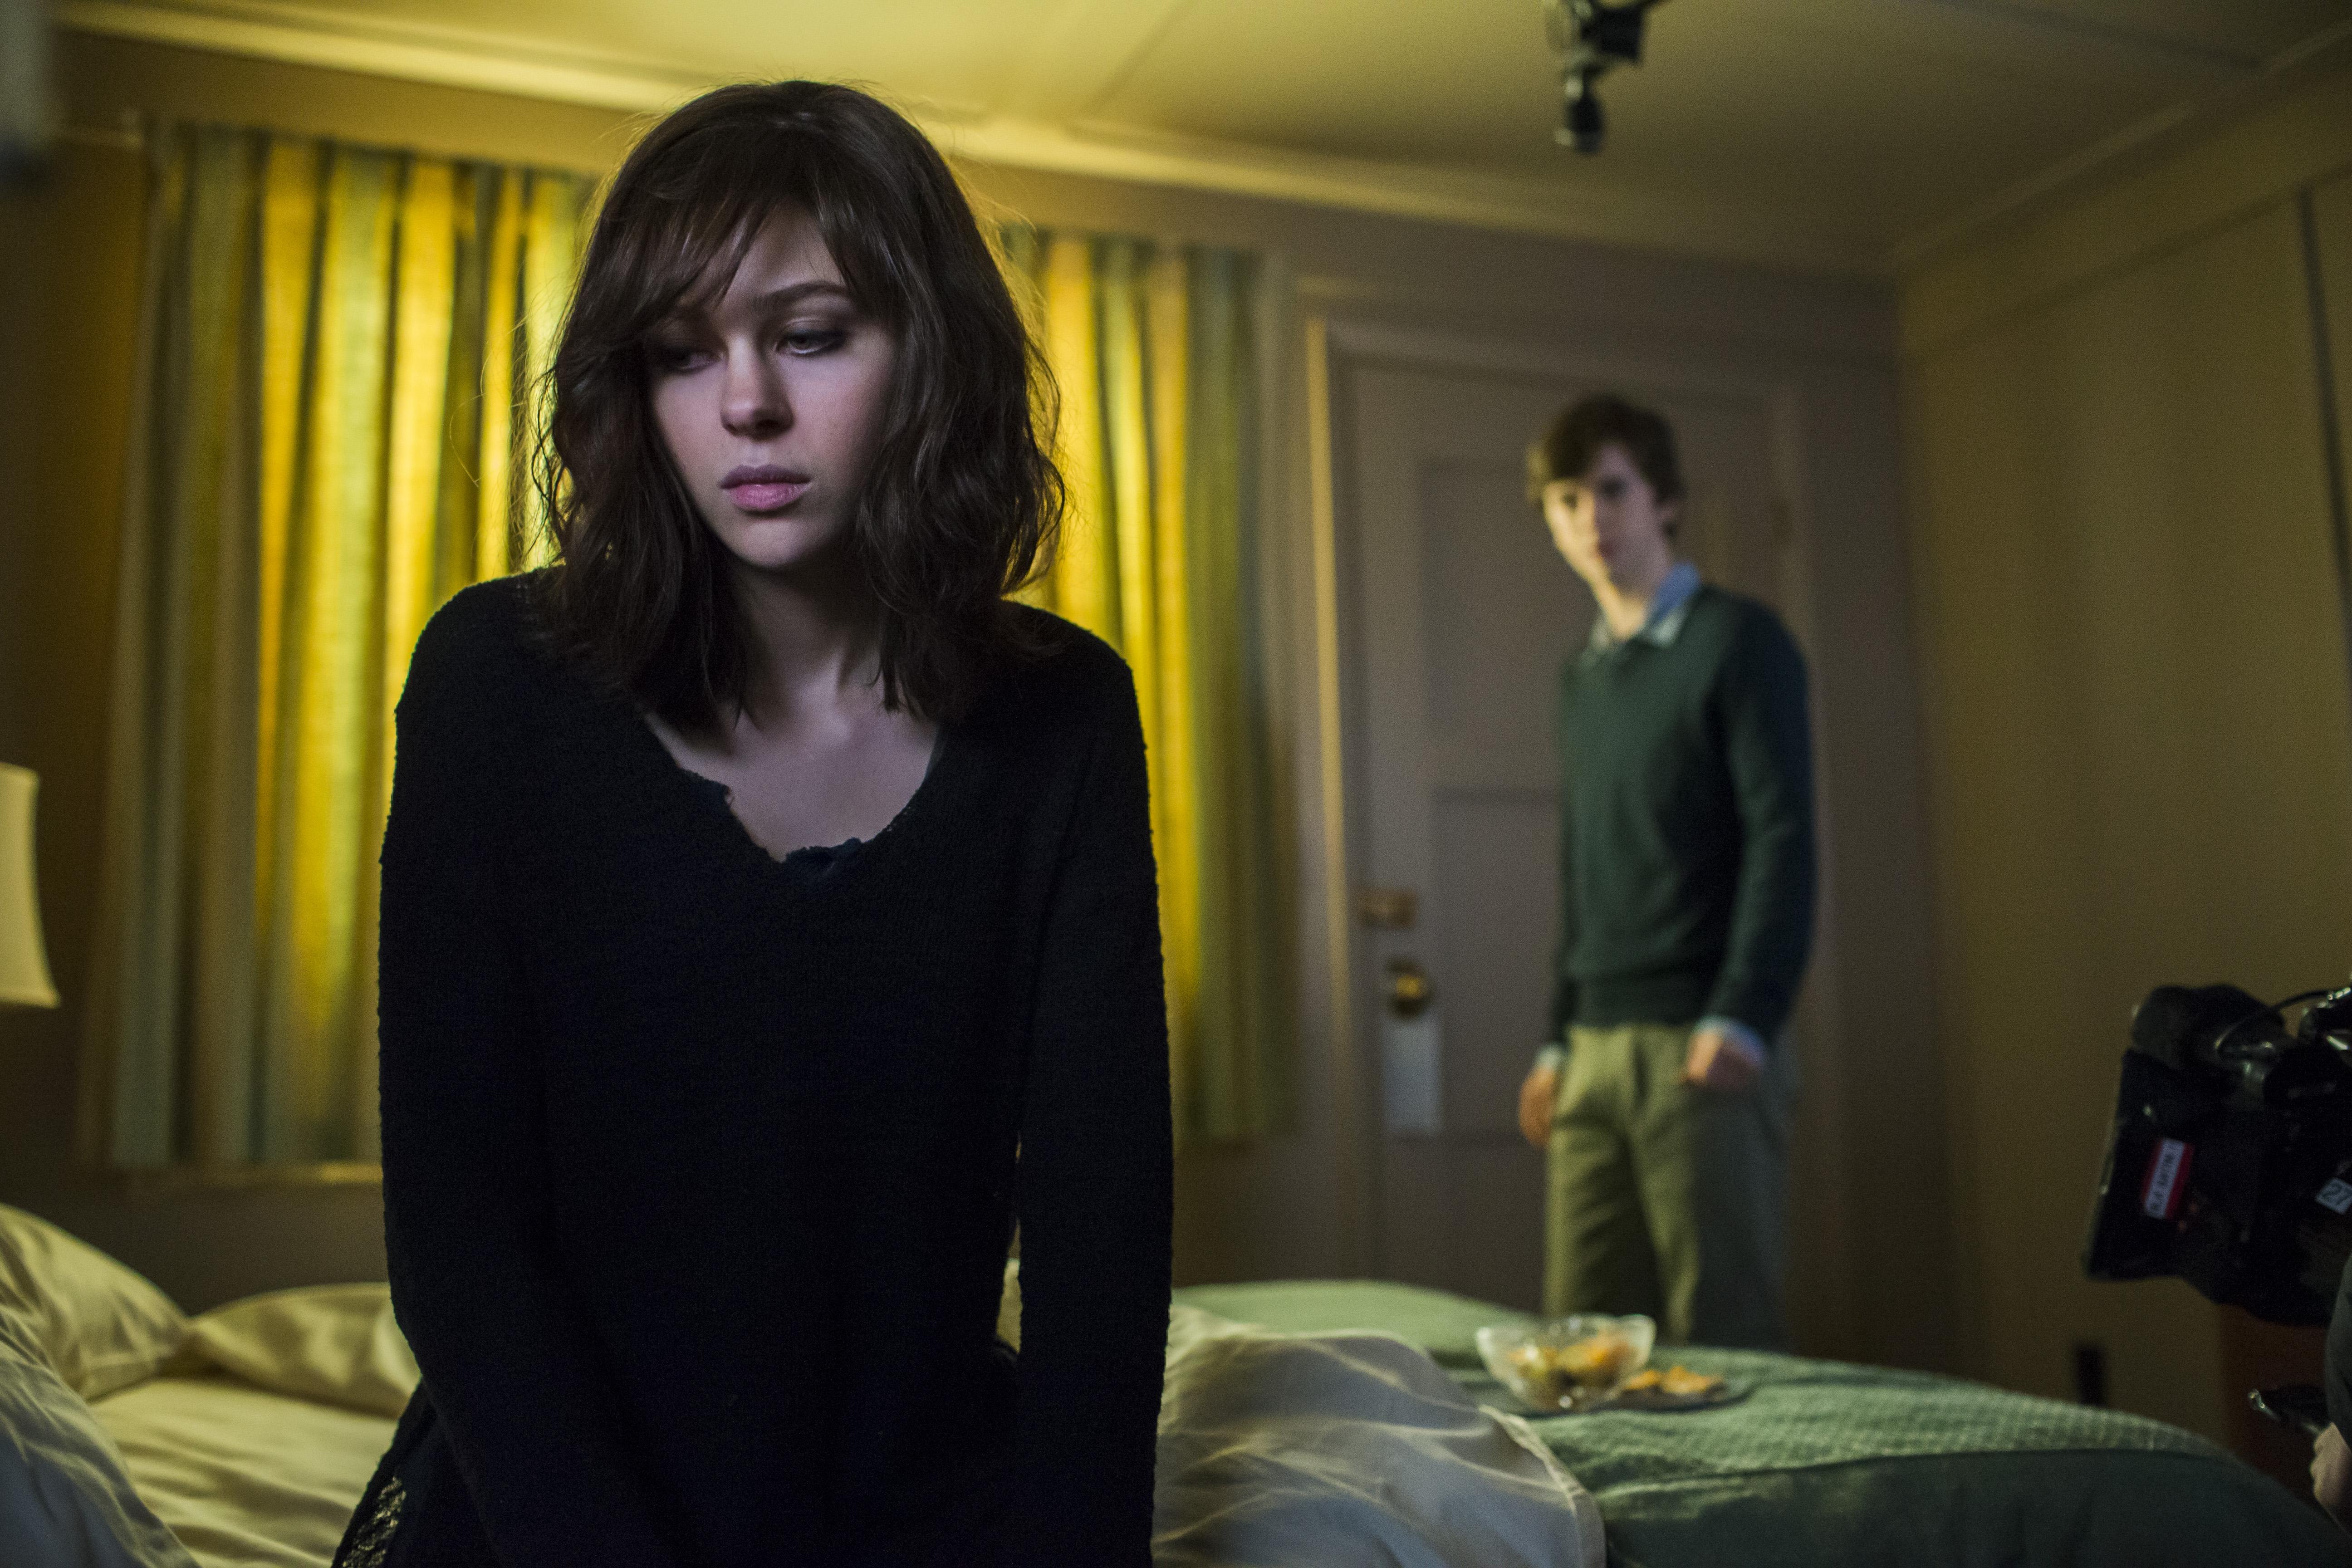 Freddie Highmore and Nicola Peltz in Bates Motel (2013)